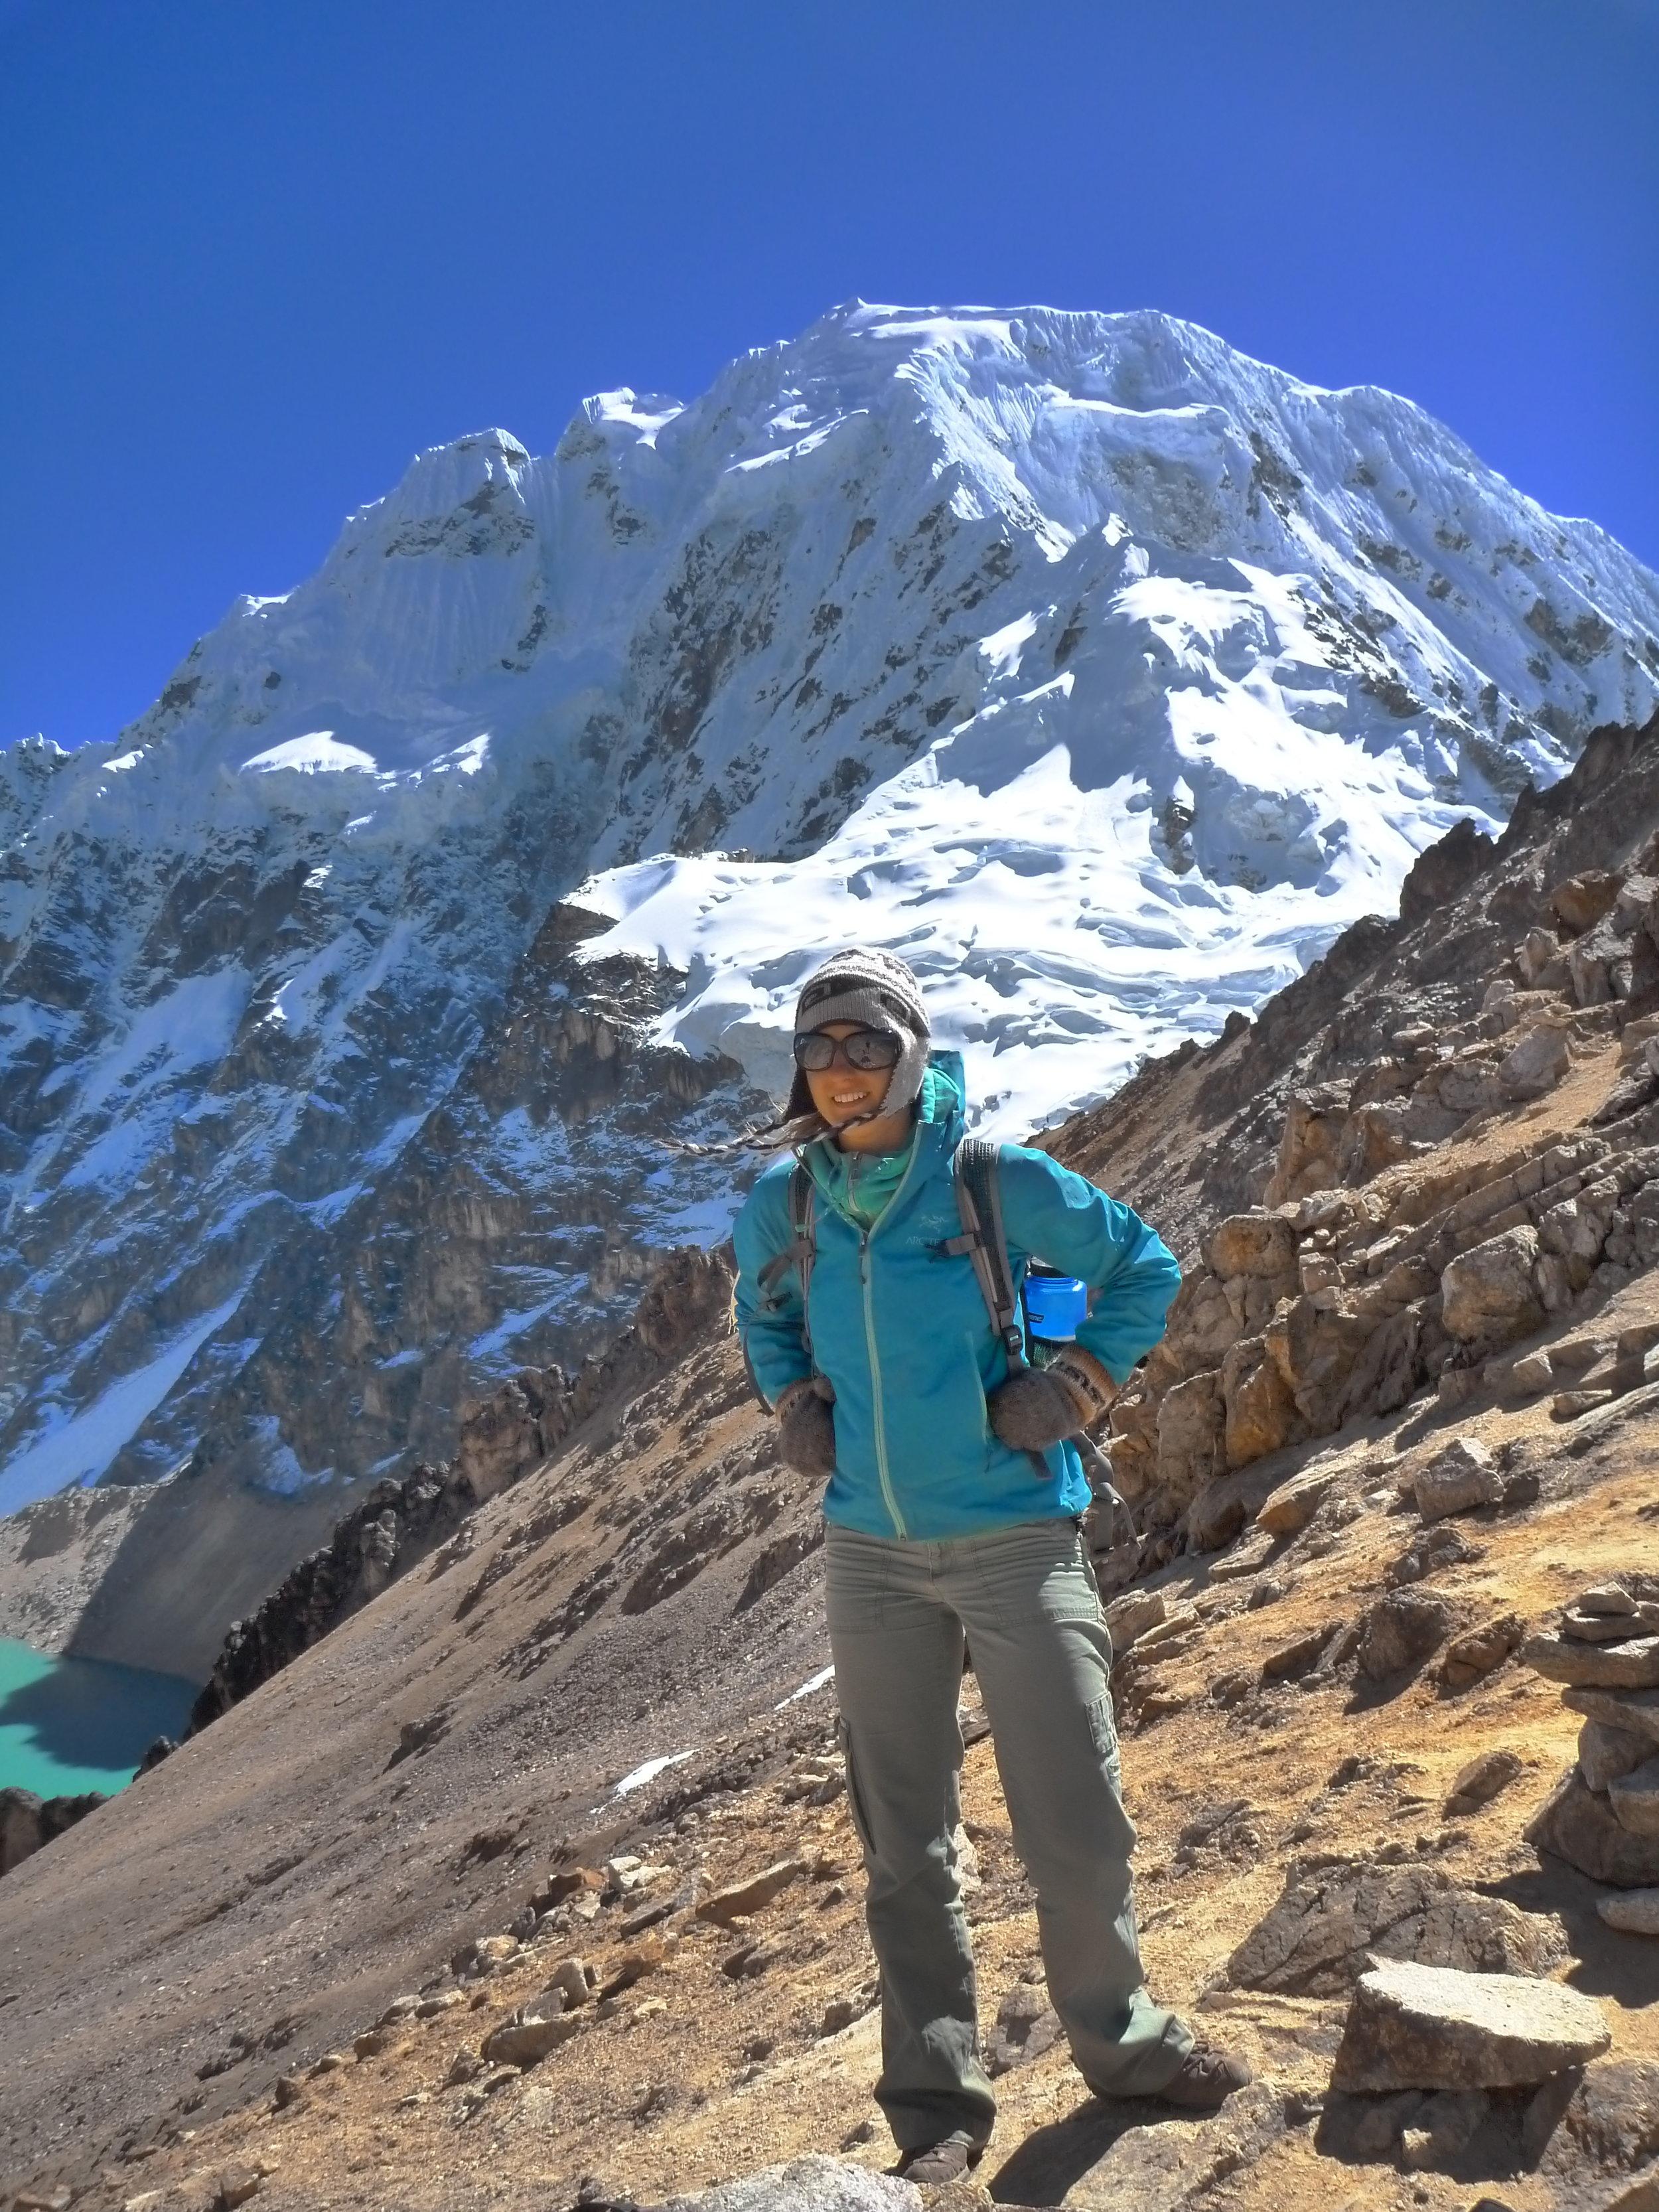 Mountain pass at 5000m in Peru